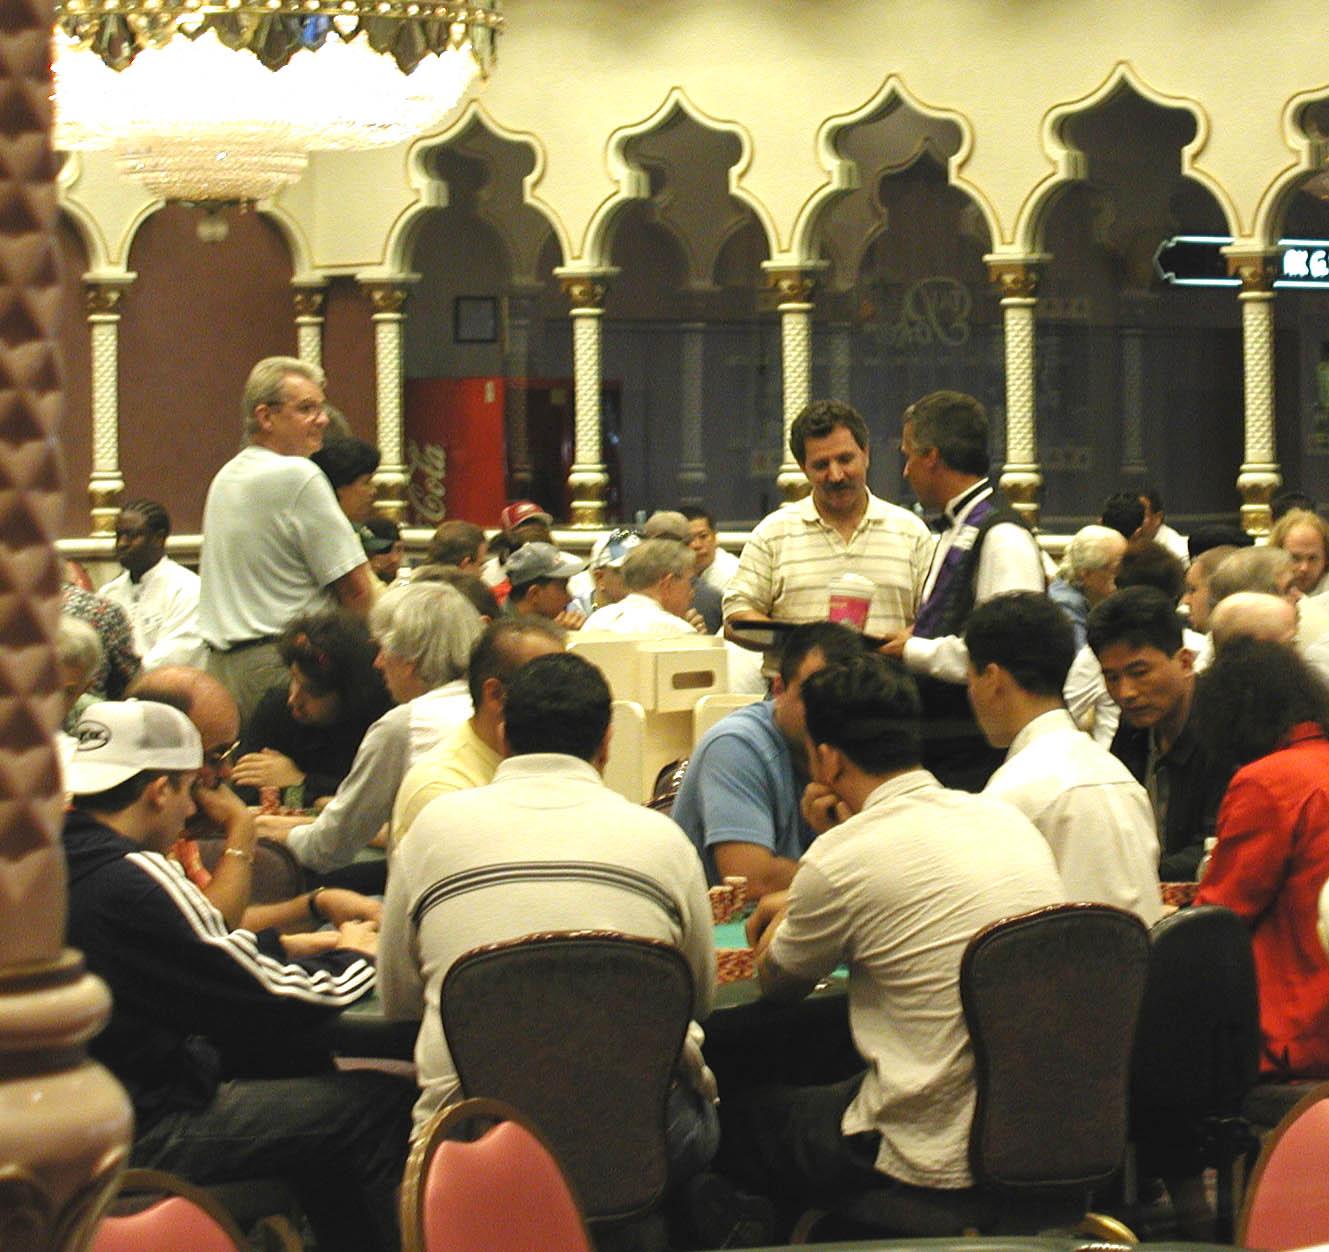 Atlantic casino city mahal nj poker poker room taj trump bubble town 2 game download for pc